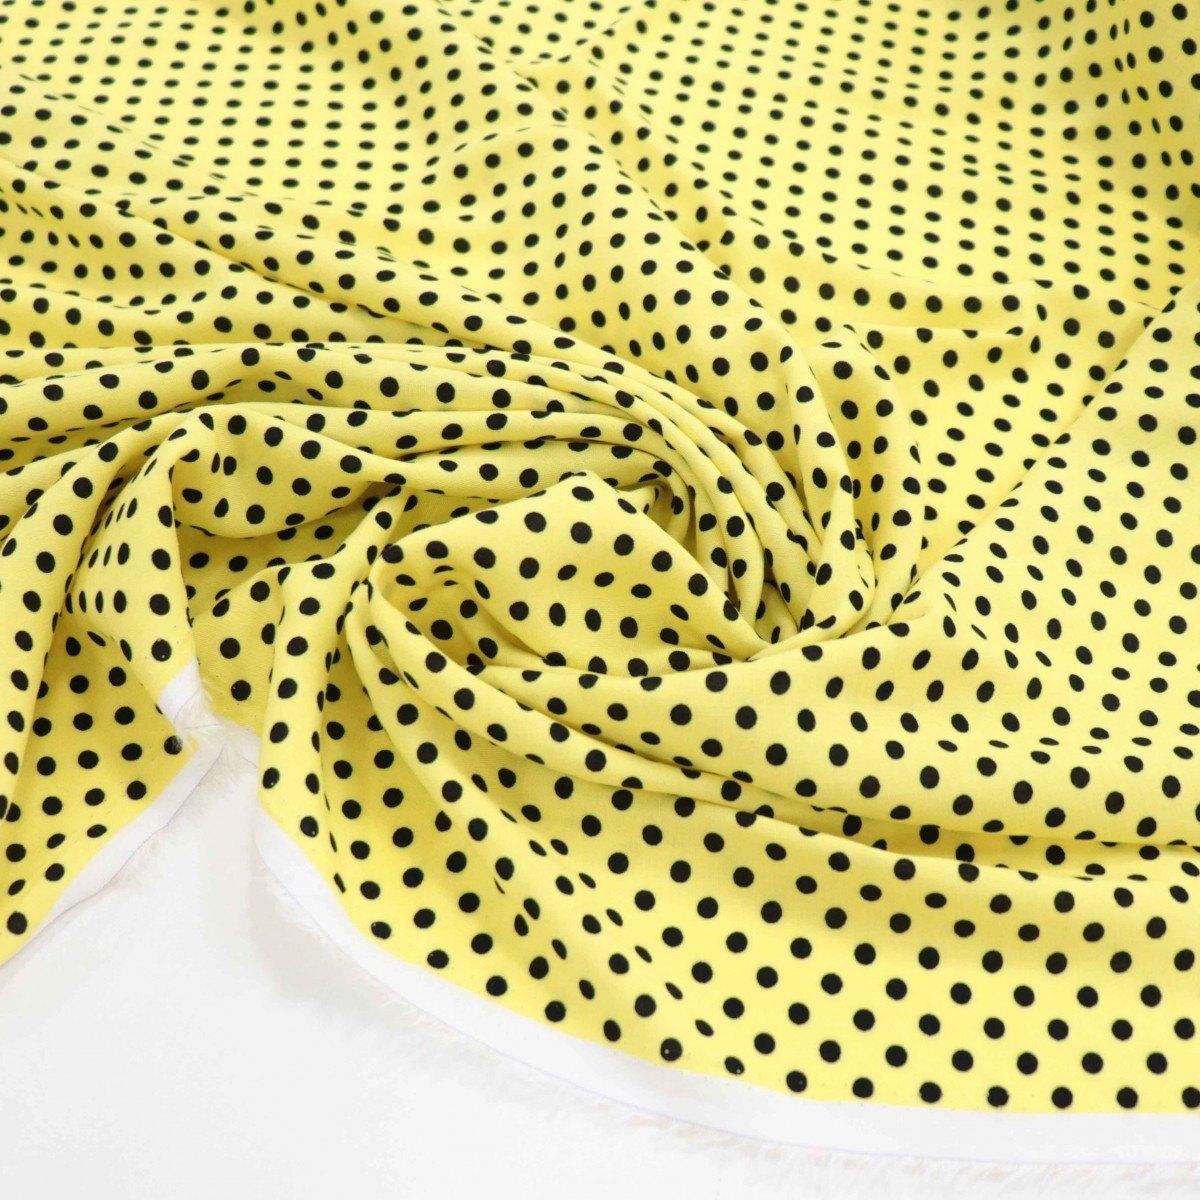 Tecido Viscose Micro Poá Amarelo e Preto